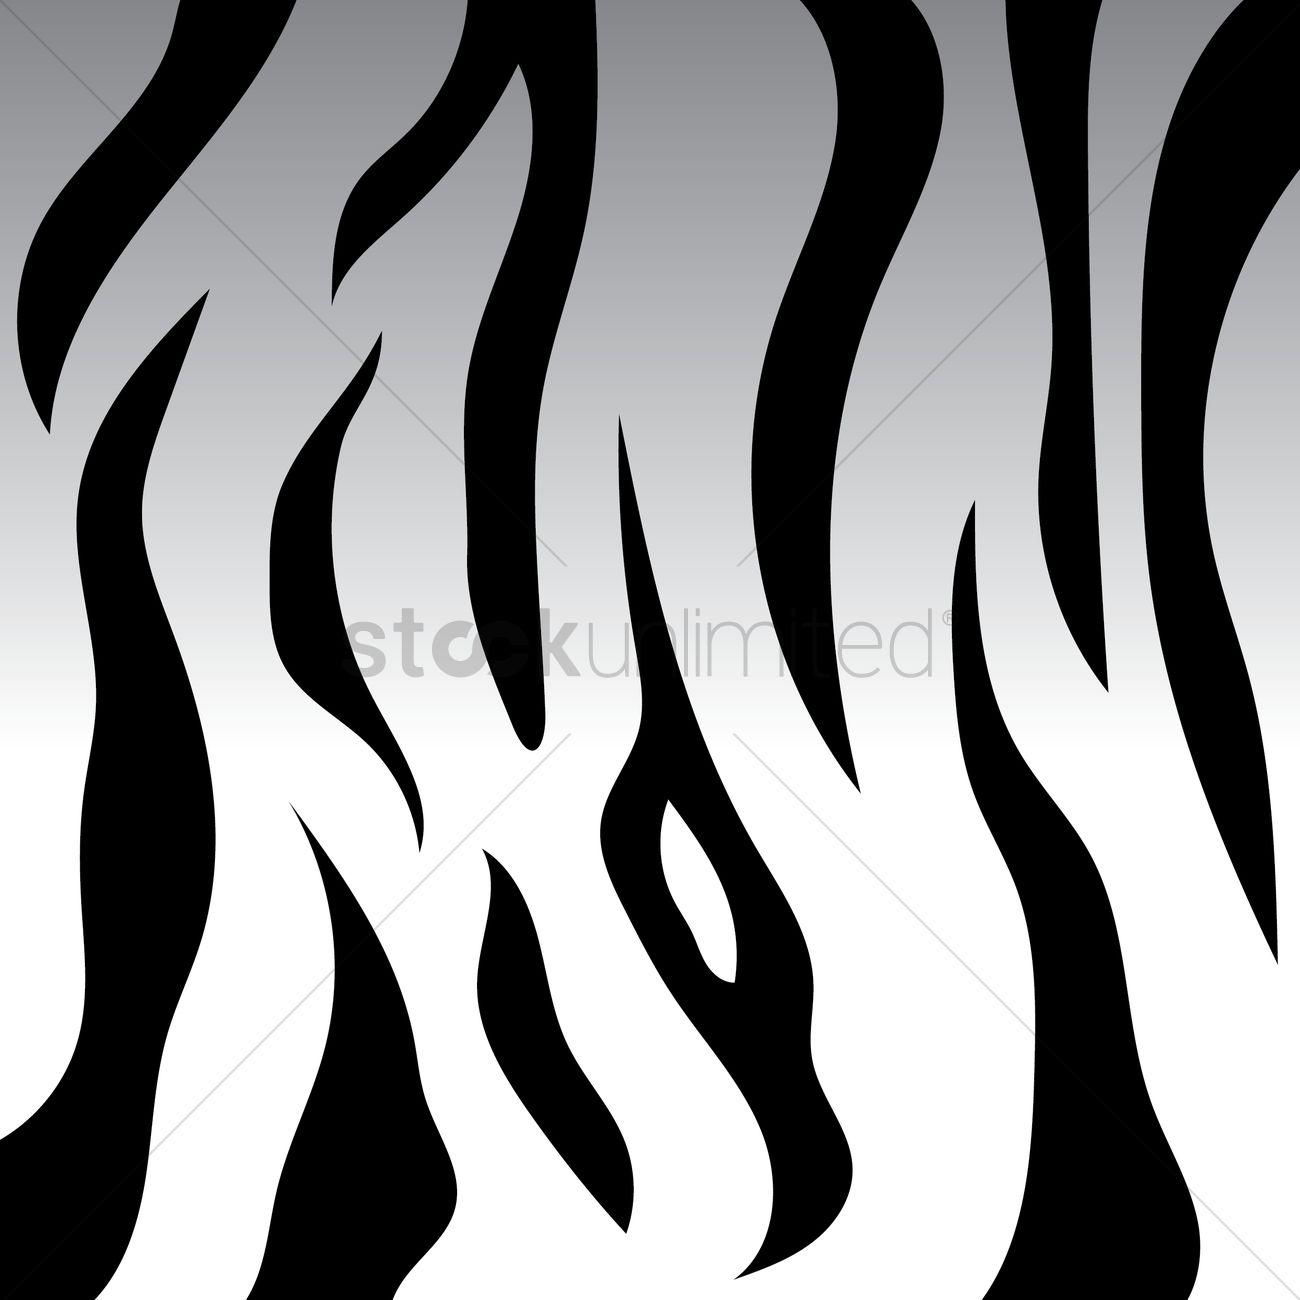 White tiger stripes background vector image 1622414 - Tiger stripes black and white ...